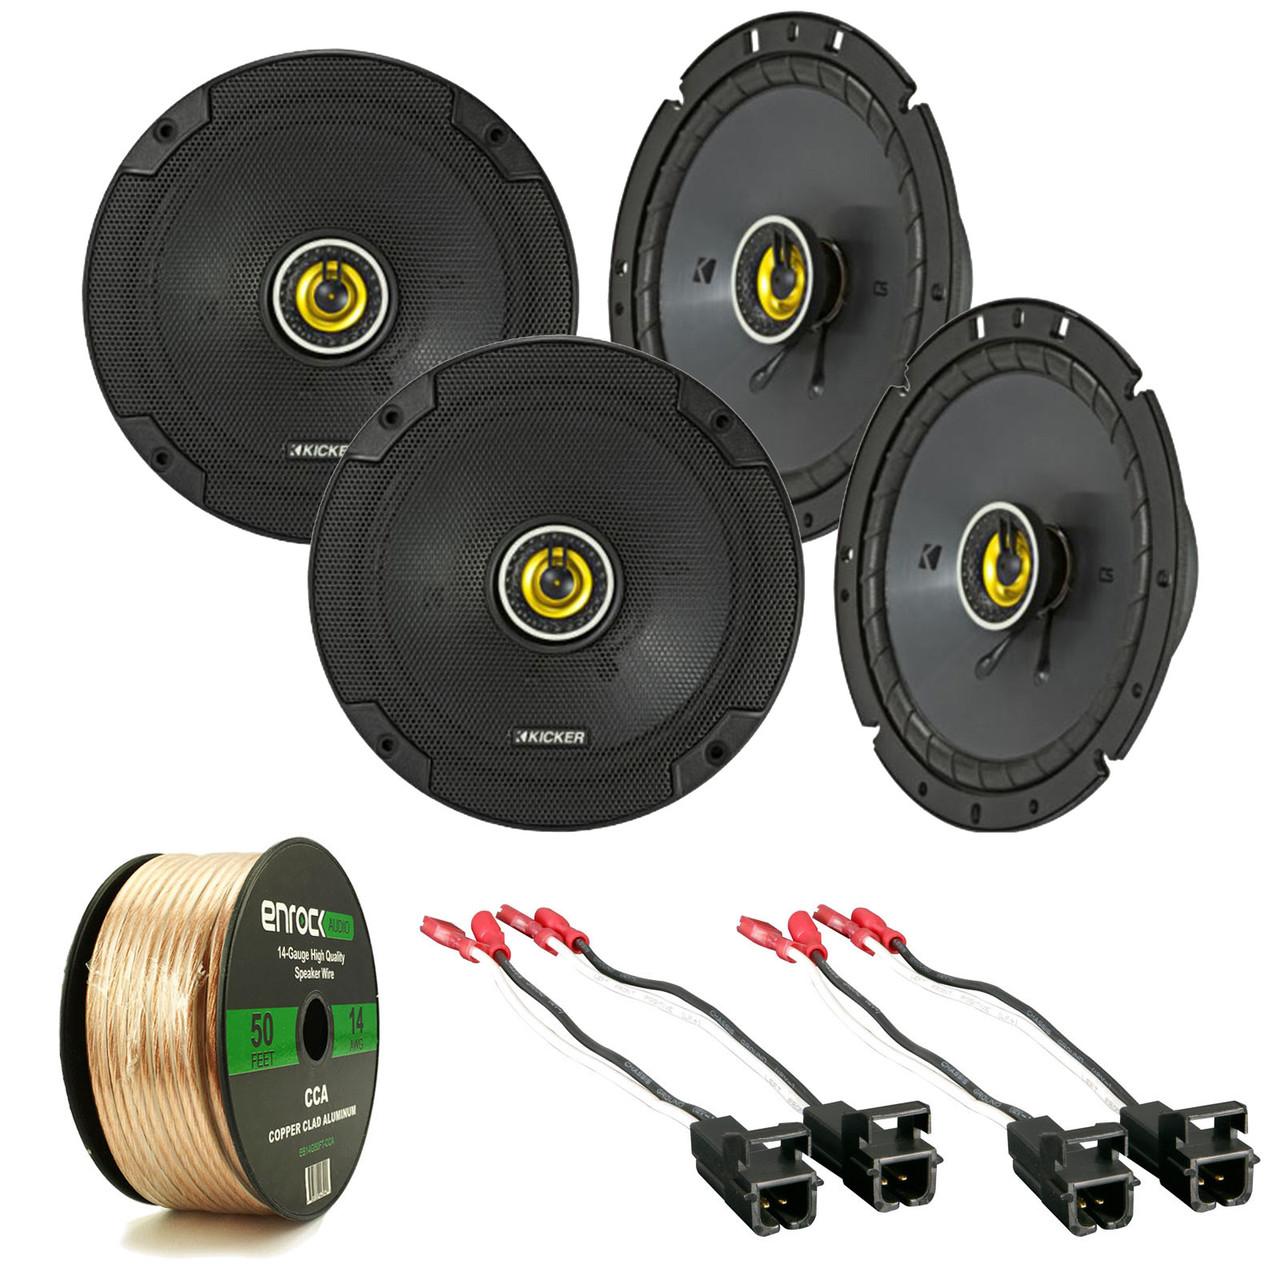 8x kicker 6 3 4 car speakers 2x speaker wire harness 14 awg 50ft wire r 40cs674 2 72 4568 road entertainment [ 1280 x 1280 Pixel ]